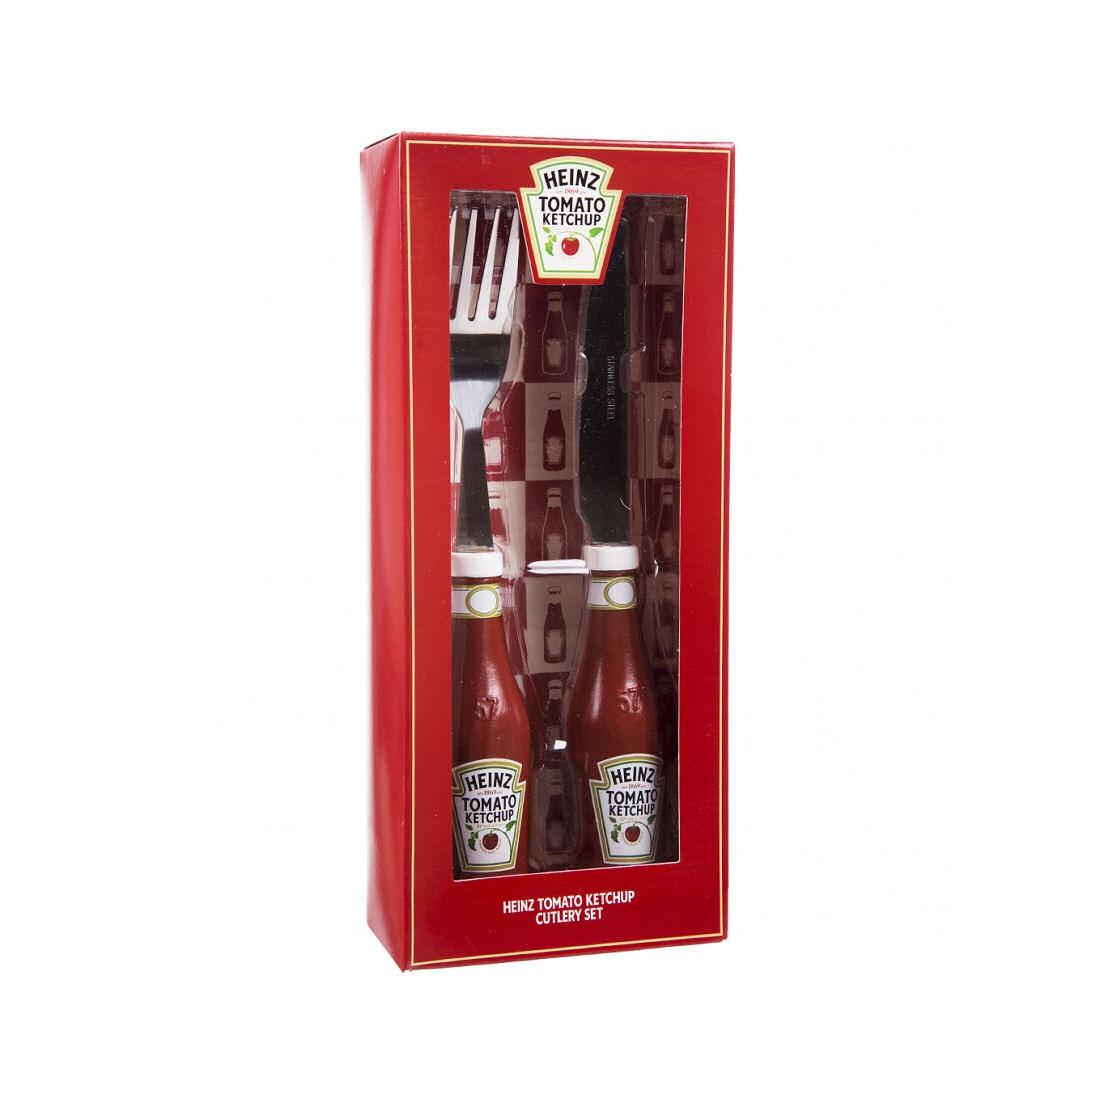 Heinz Tomato Ketchup Cutlery Set Knife Fork Red Bottle 3d